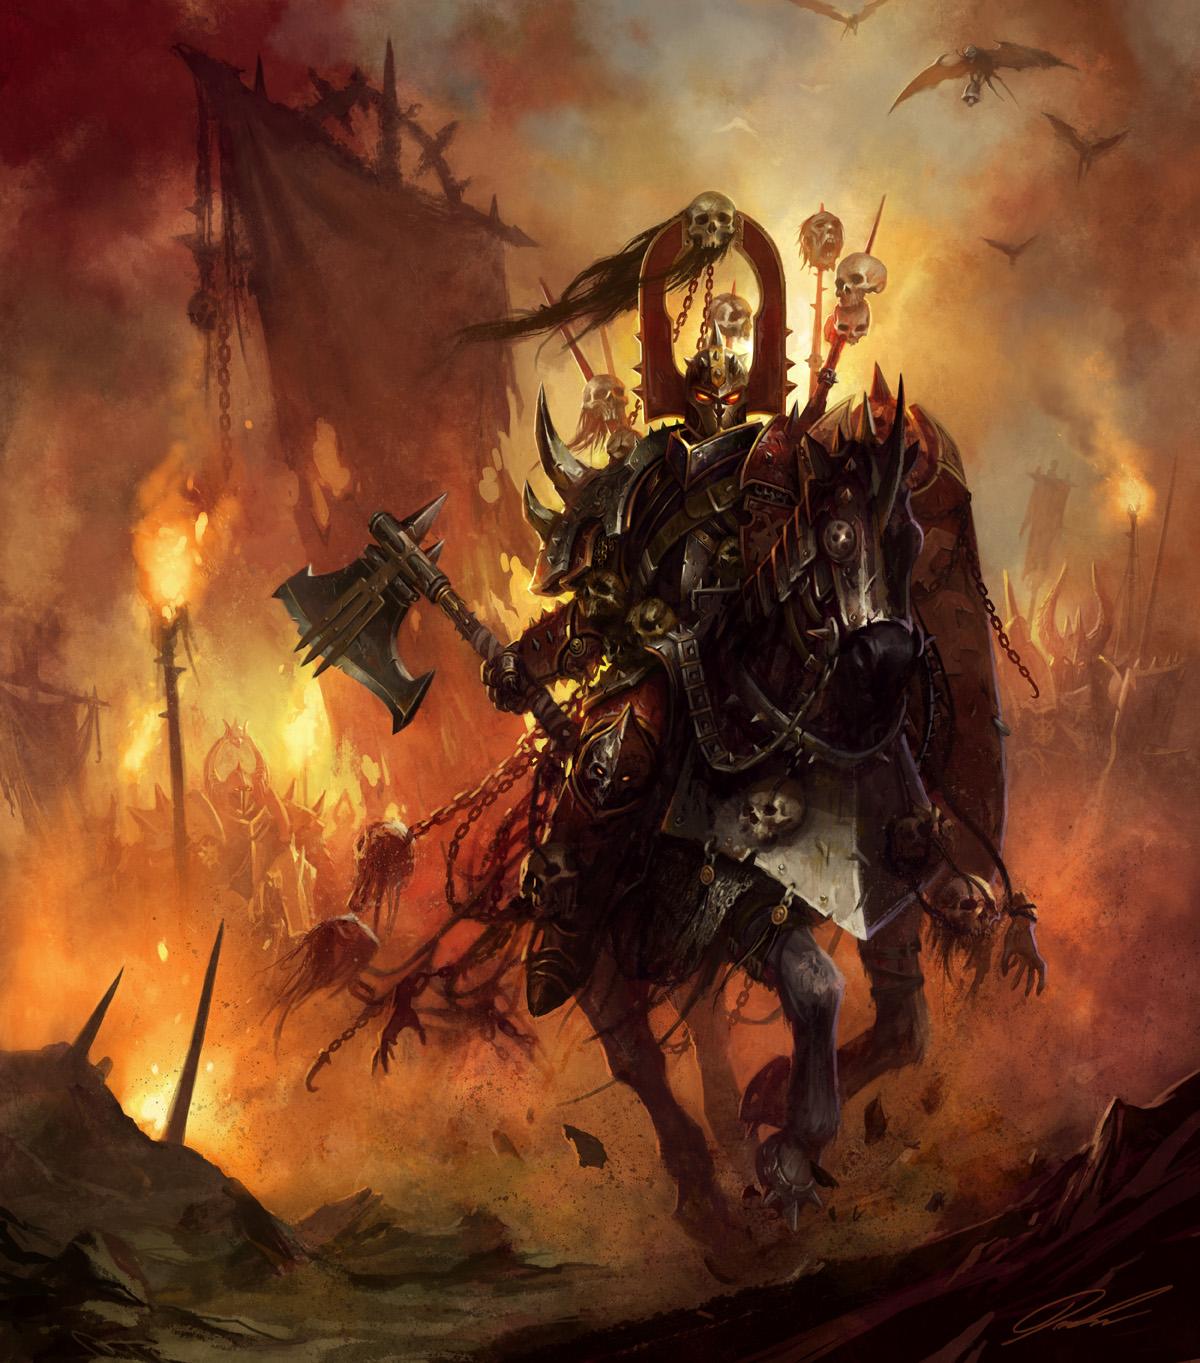 [Warhammer Fantasy Battle] Images du Chaos  790263OmensofWarLarge